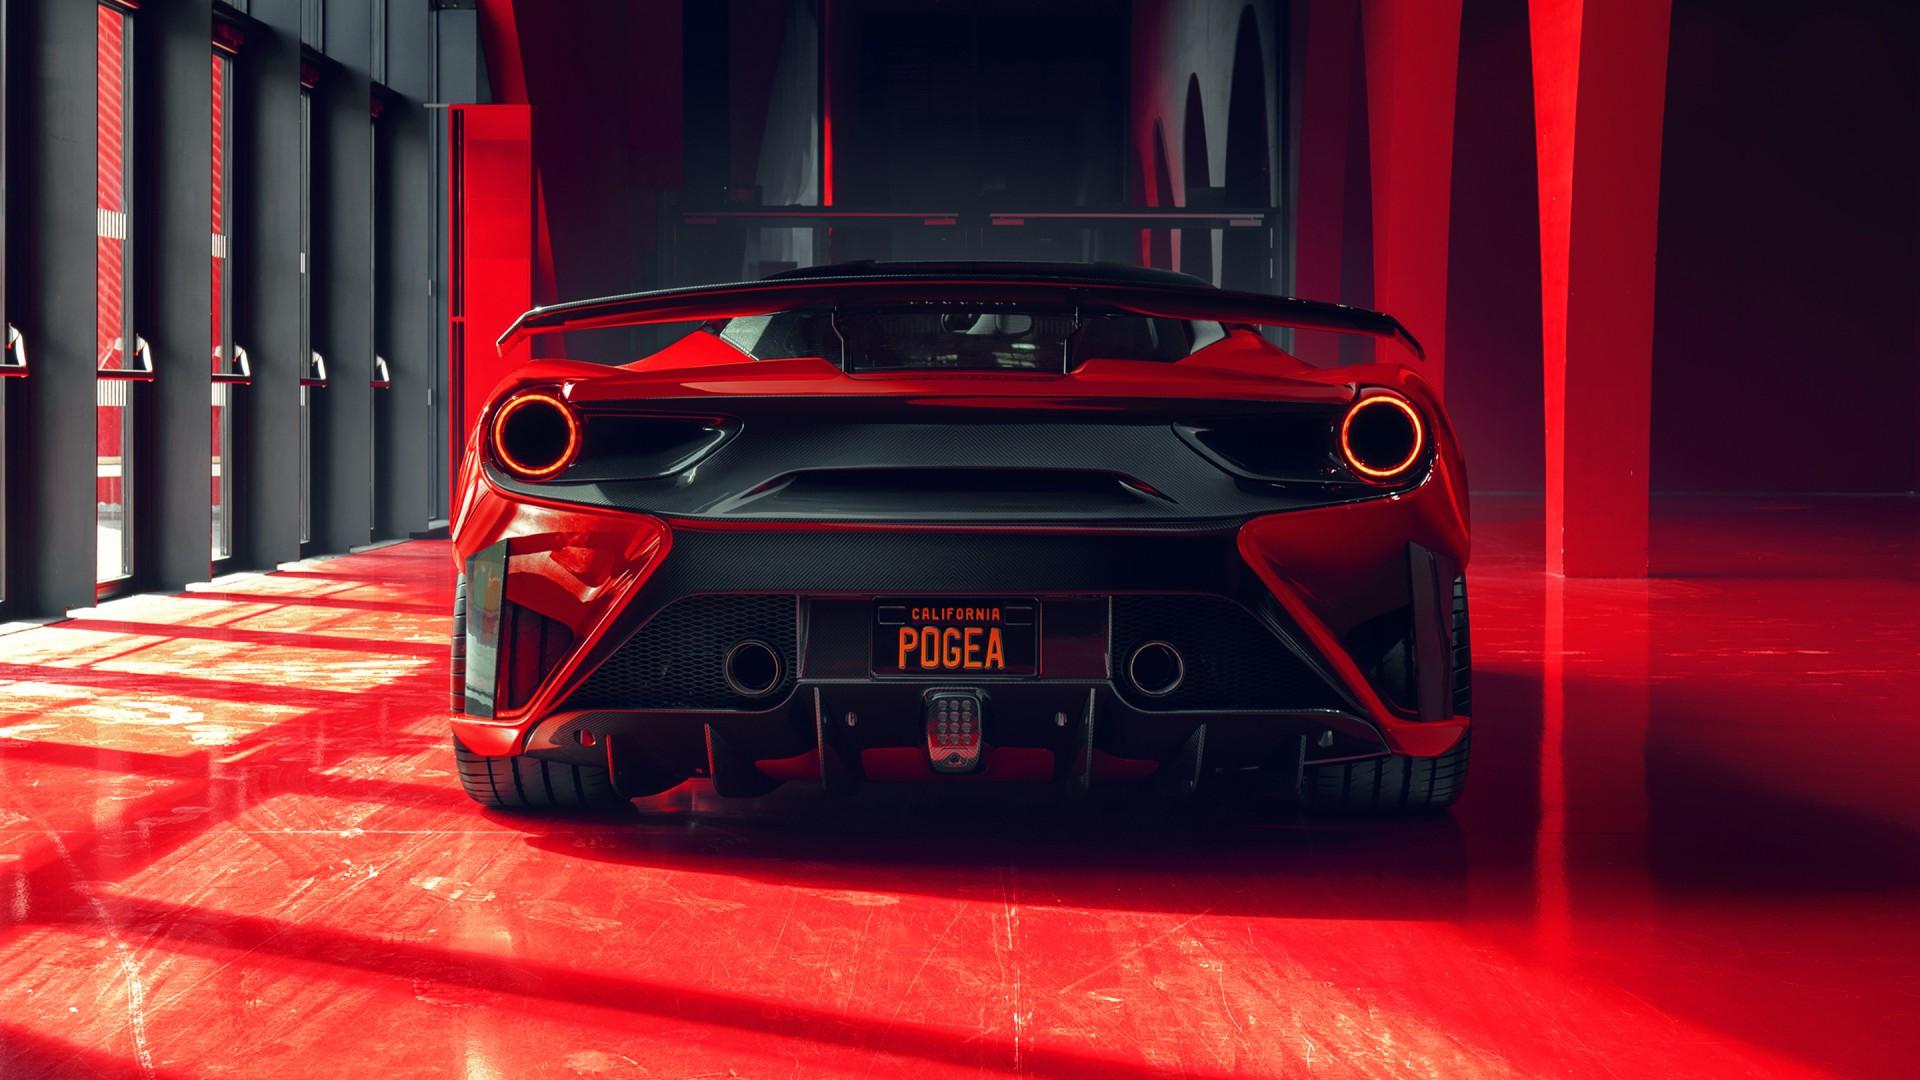 2018 Pogea Racing Fplus Corsa Ferrari 488 Gtb 2 Wallpaper